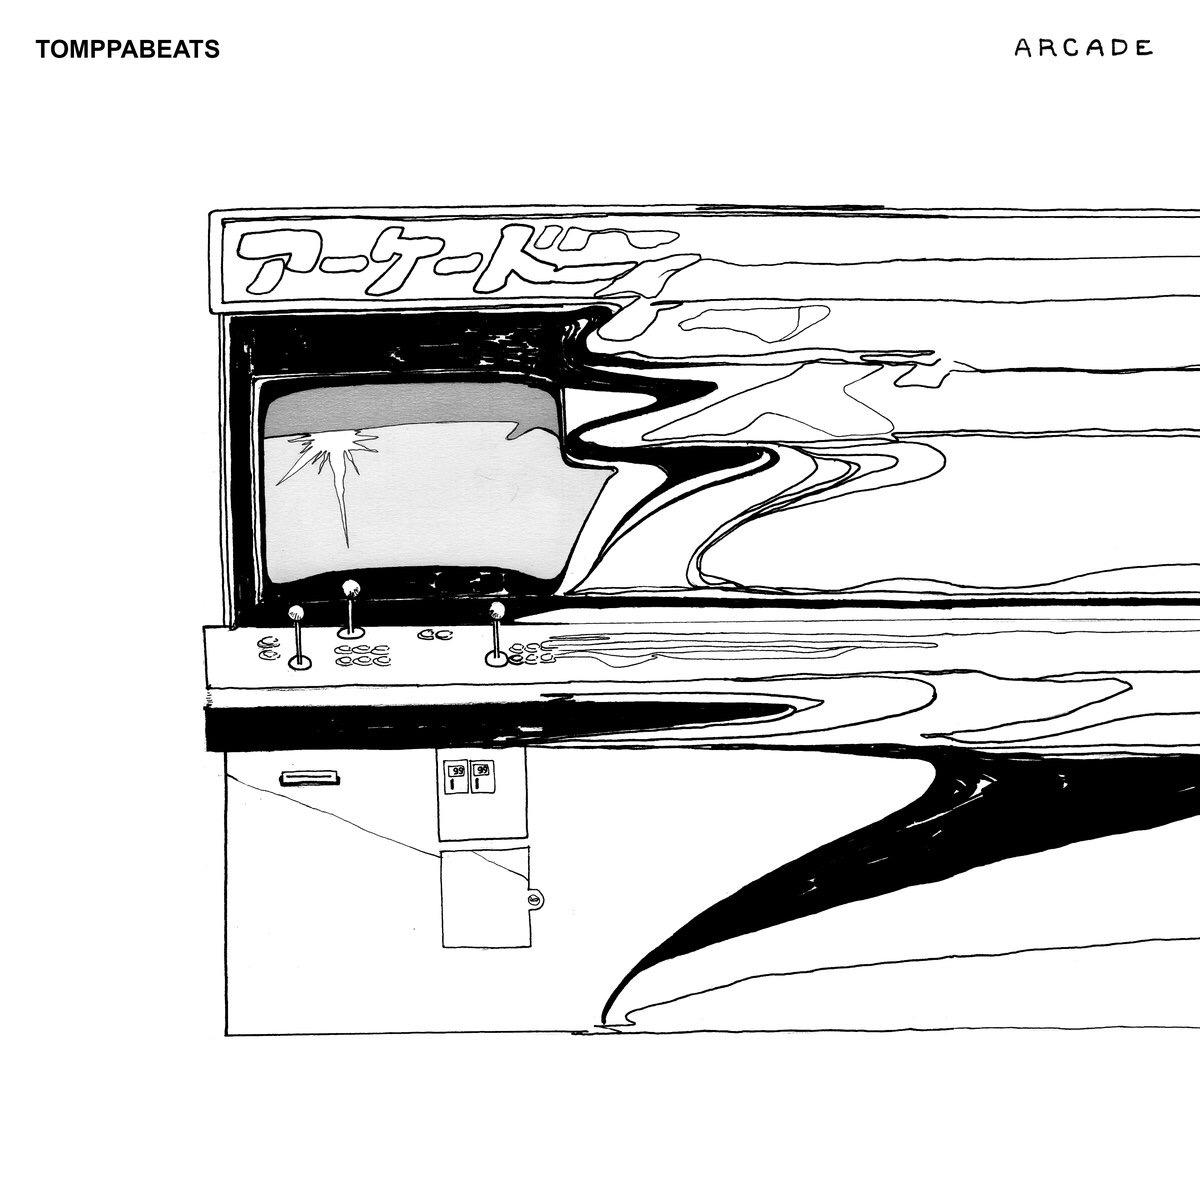 Tomppabeats – Arcade